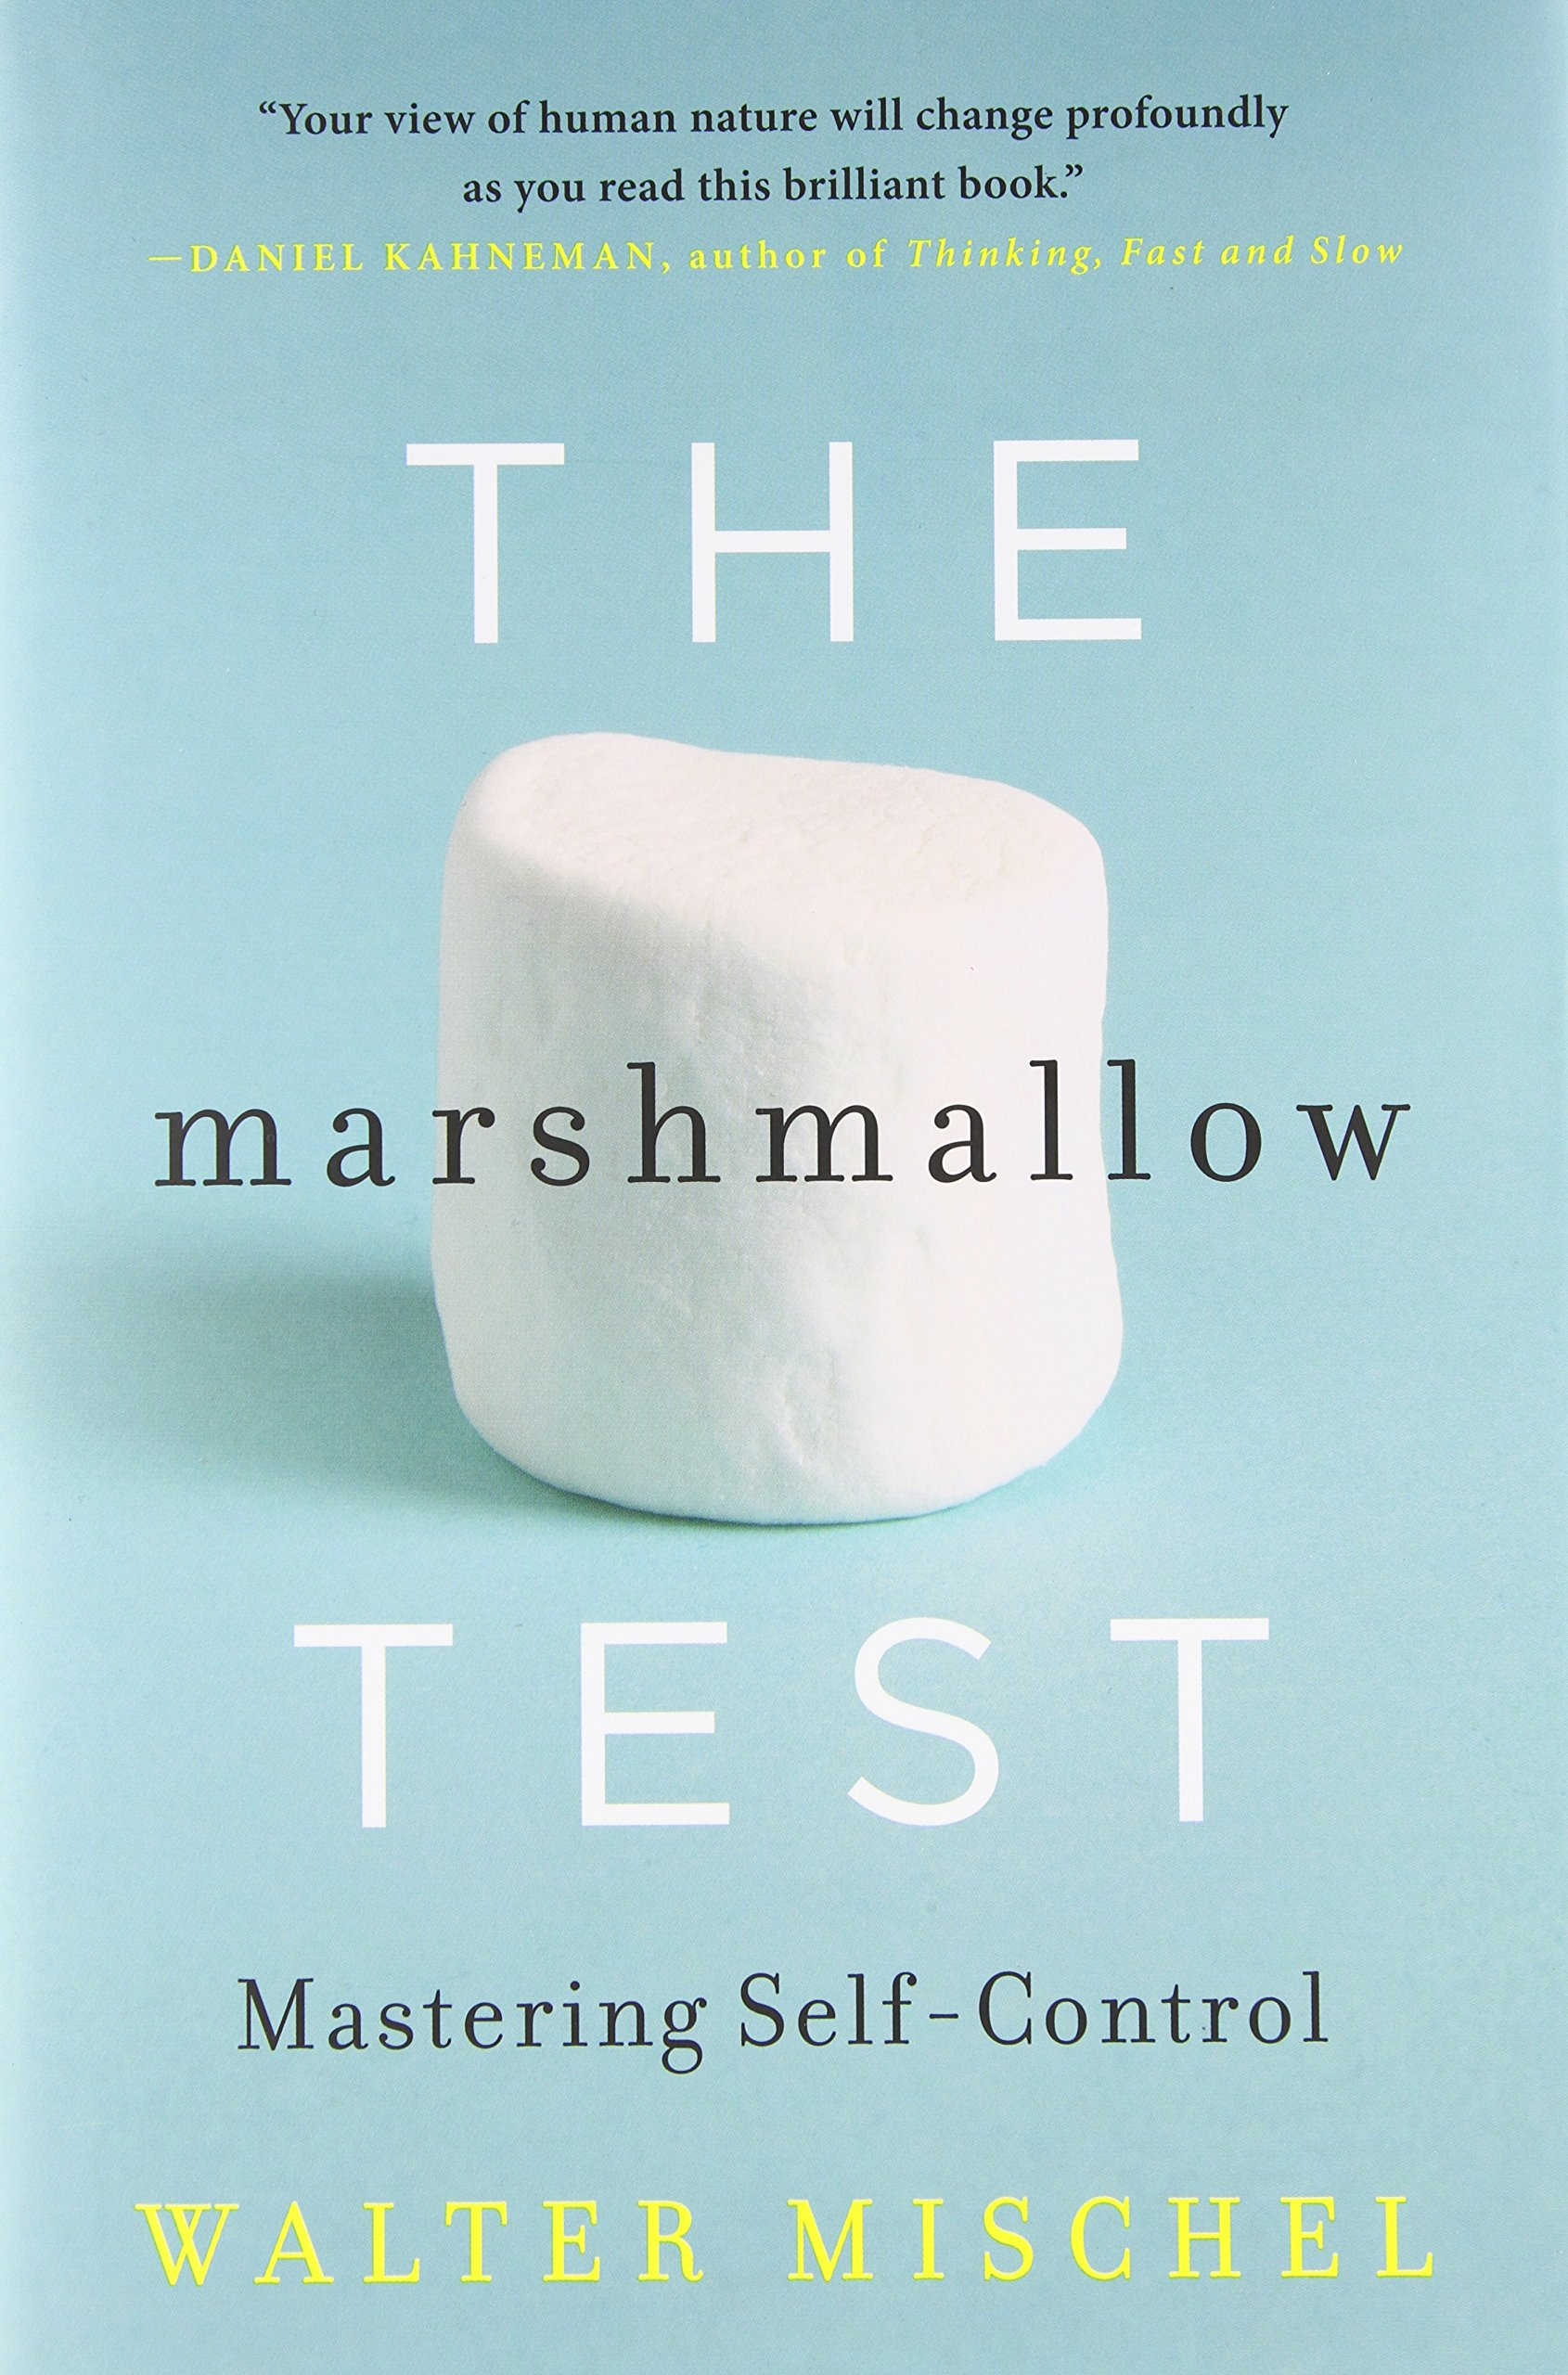 marshmallow test replication